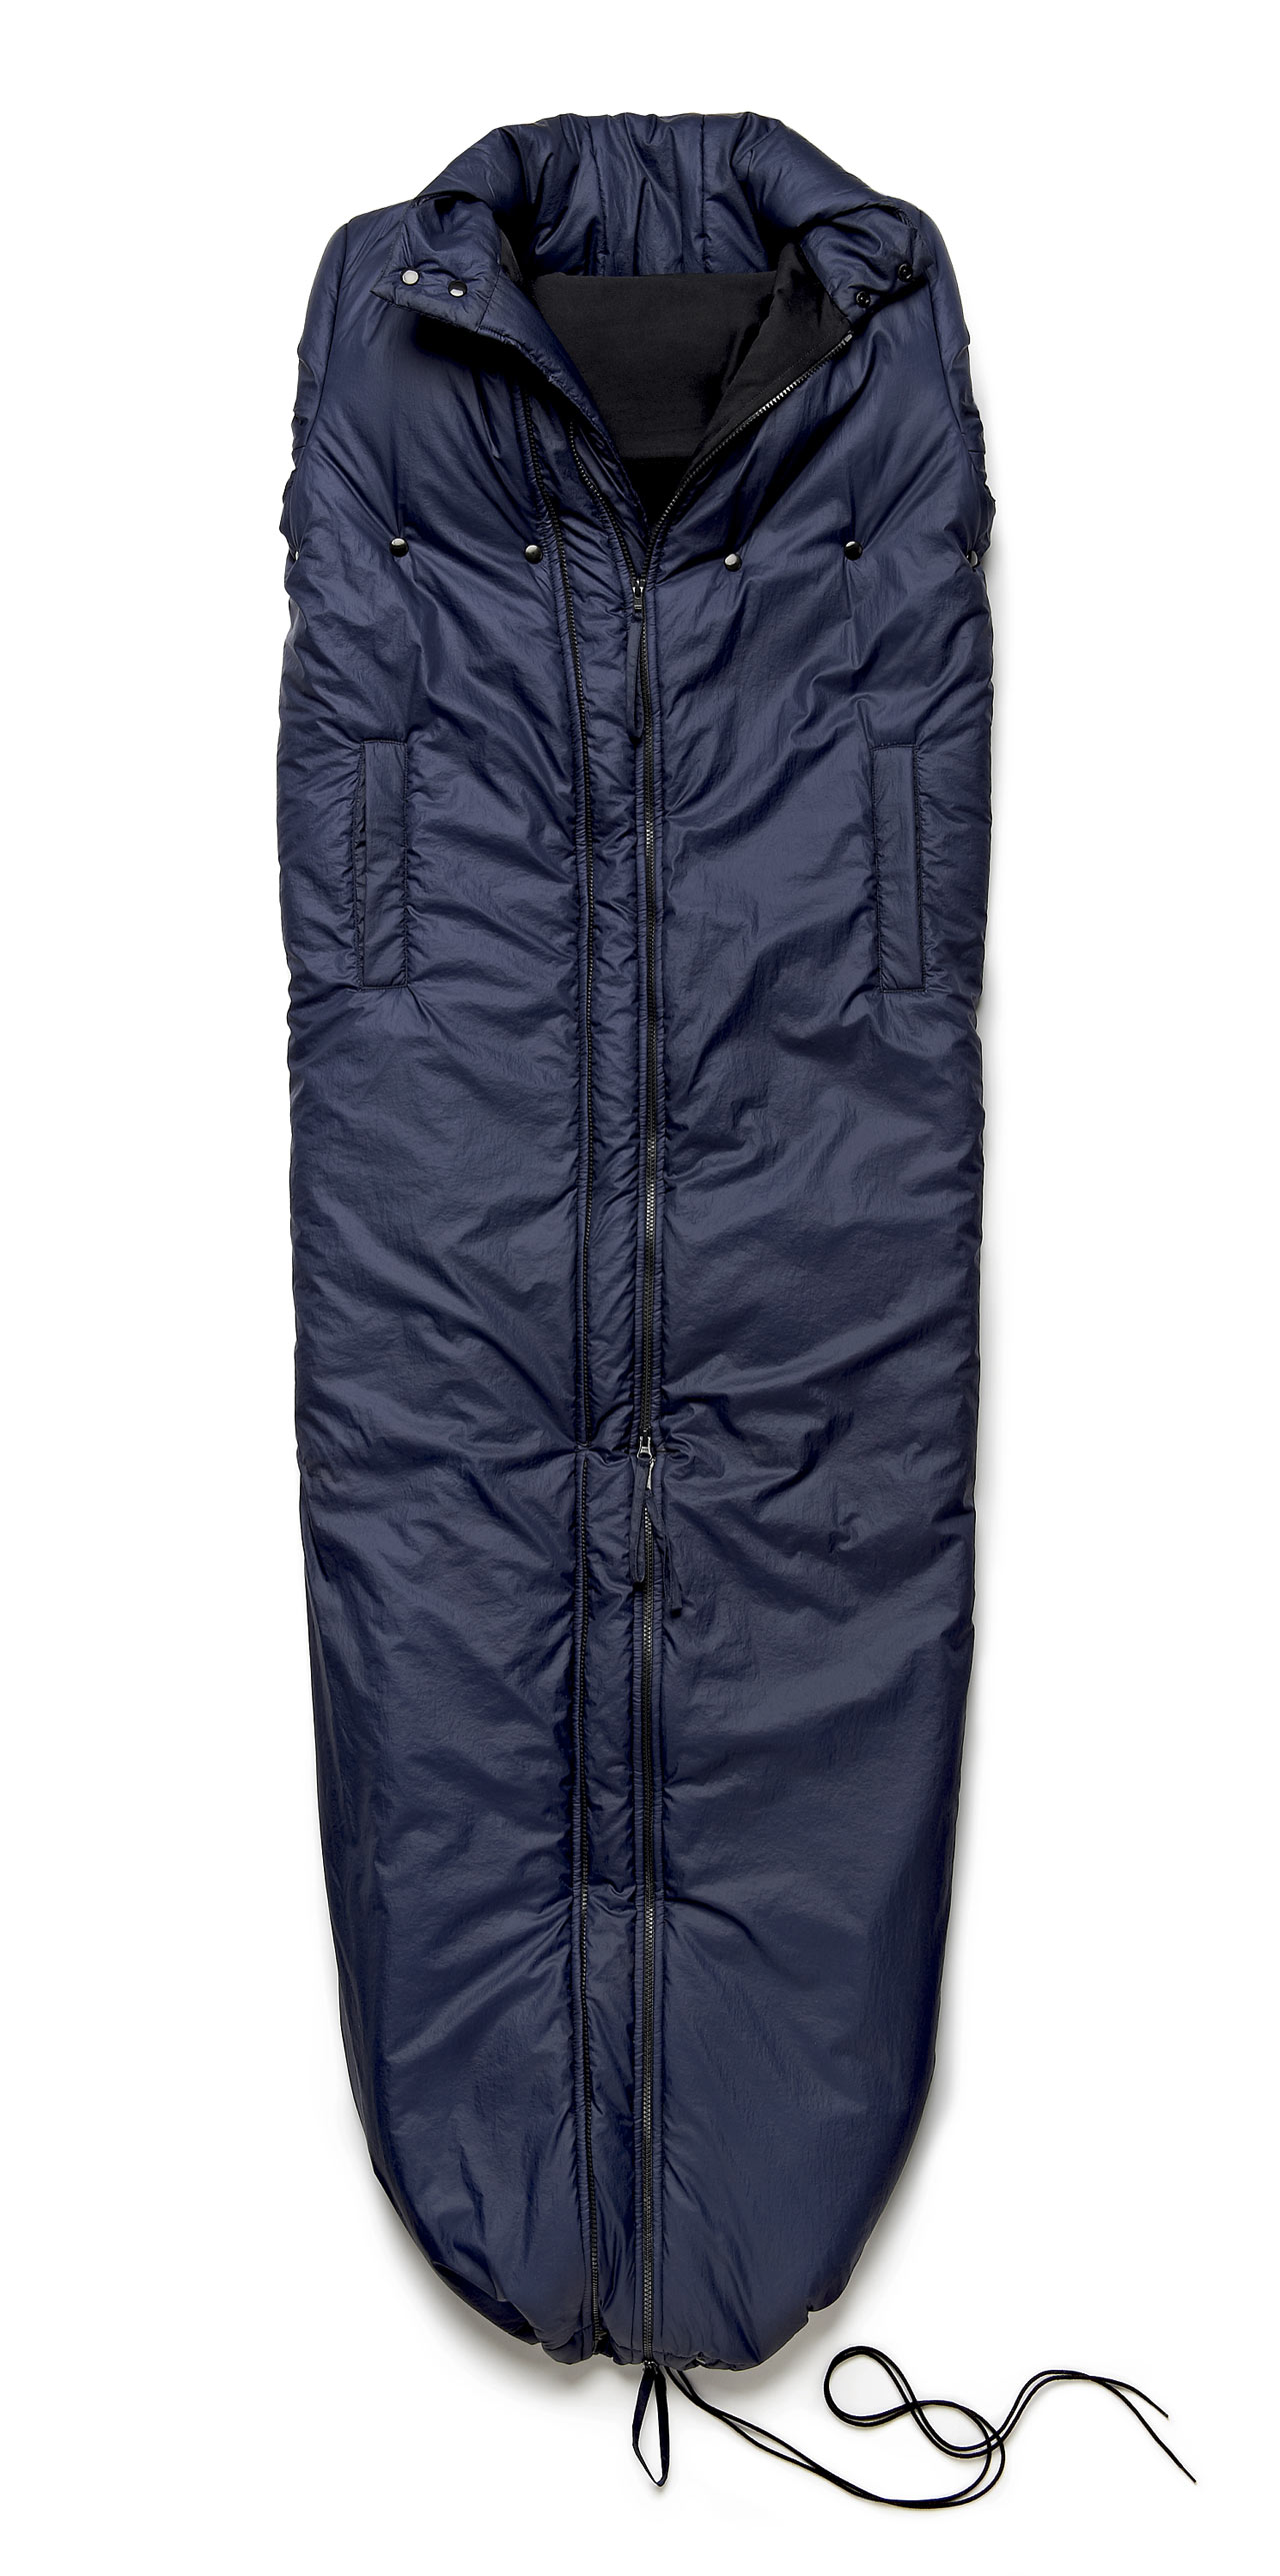 tom-dixon-adidas-sleeping-bag